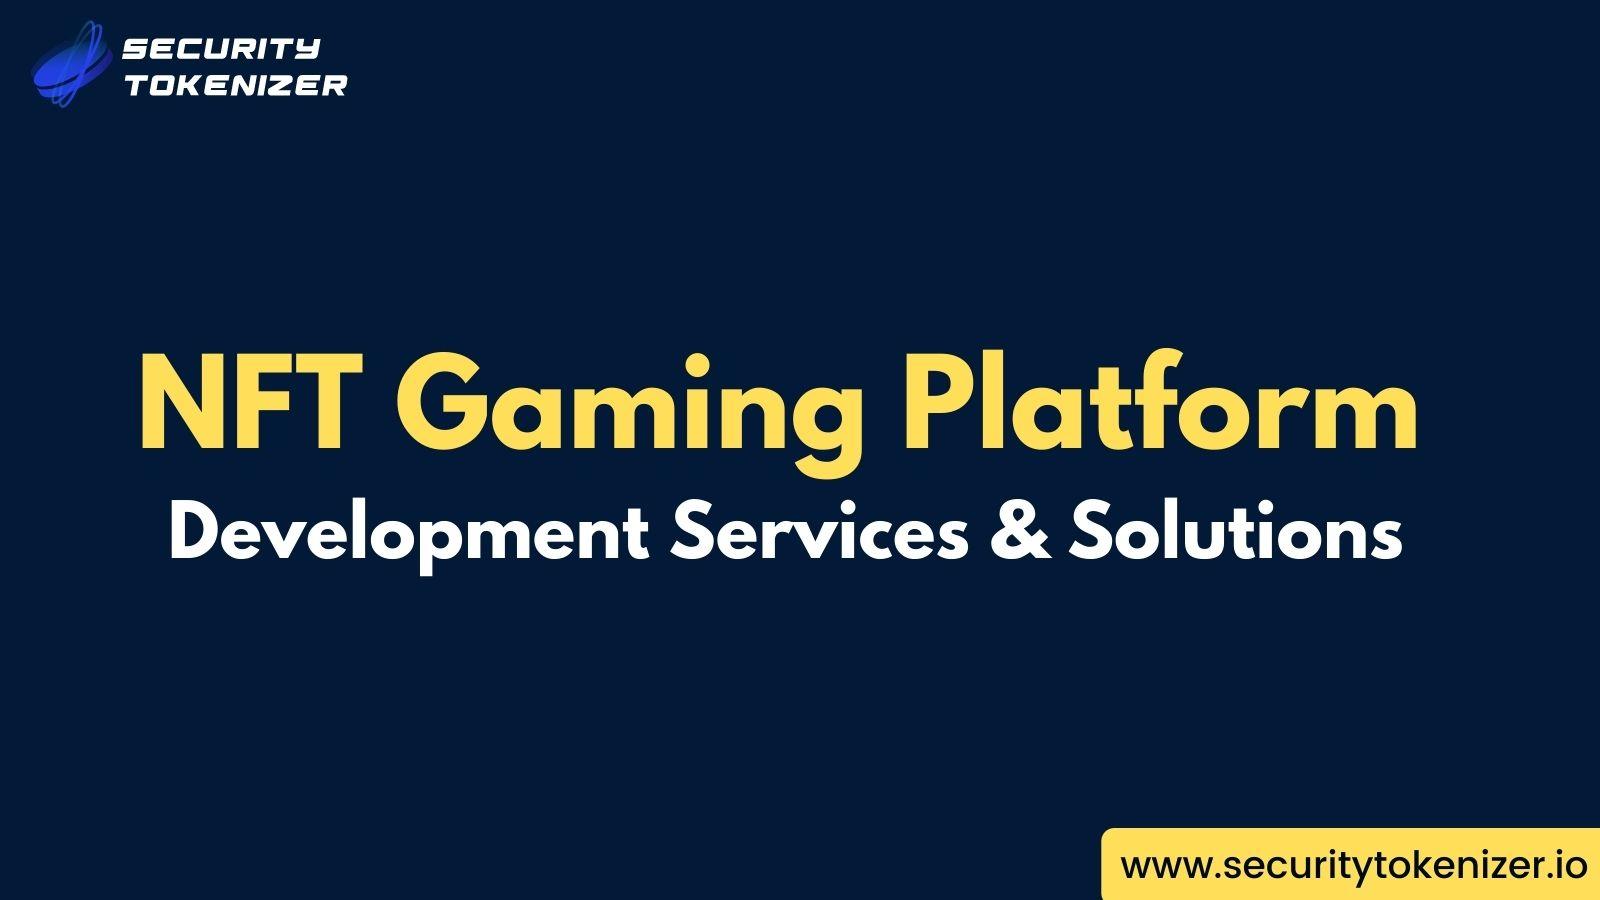 NFT Gaming Platform Development Services & Solutions Company